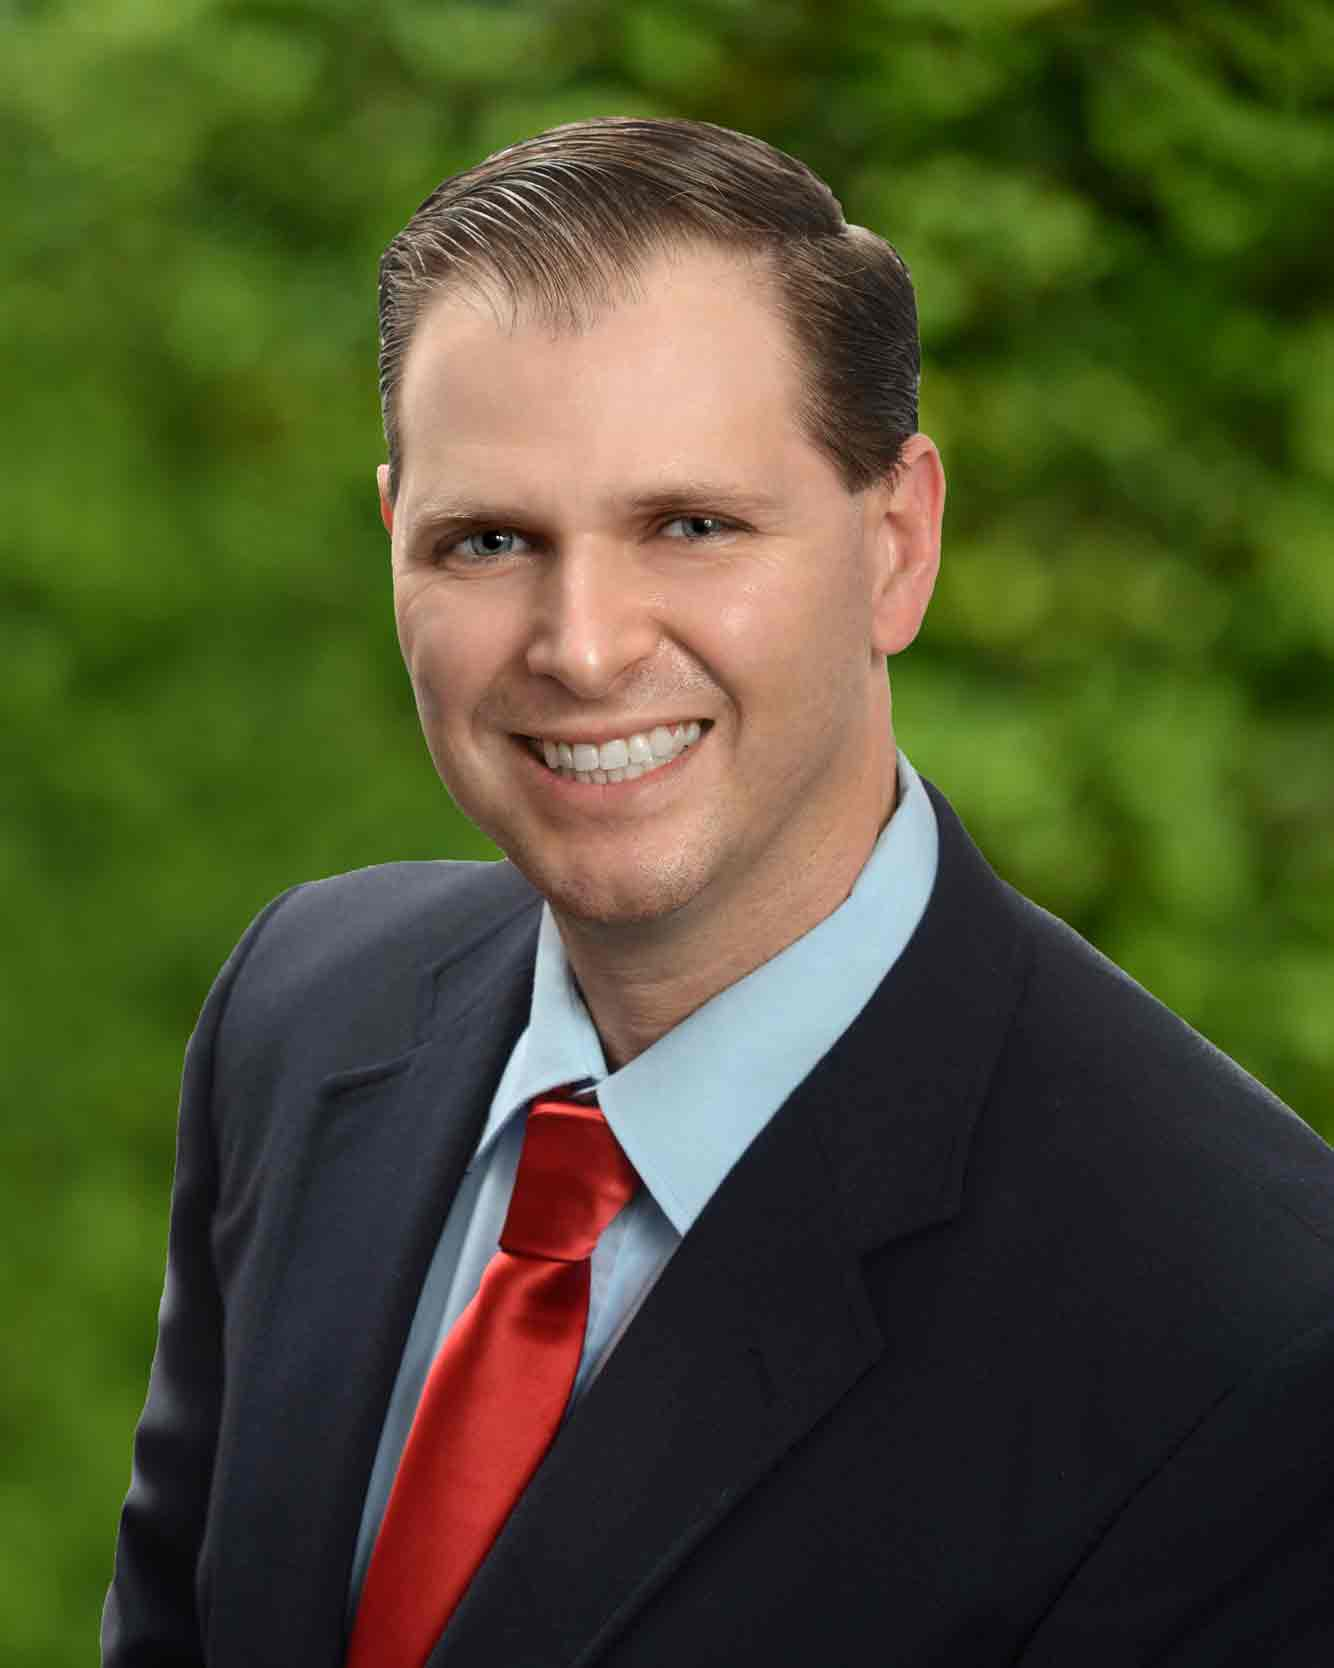 Nick_Baroni_PA-C_Florida_Orthopaedic_Associates